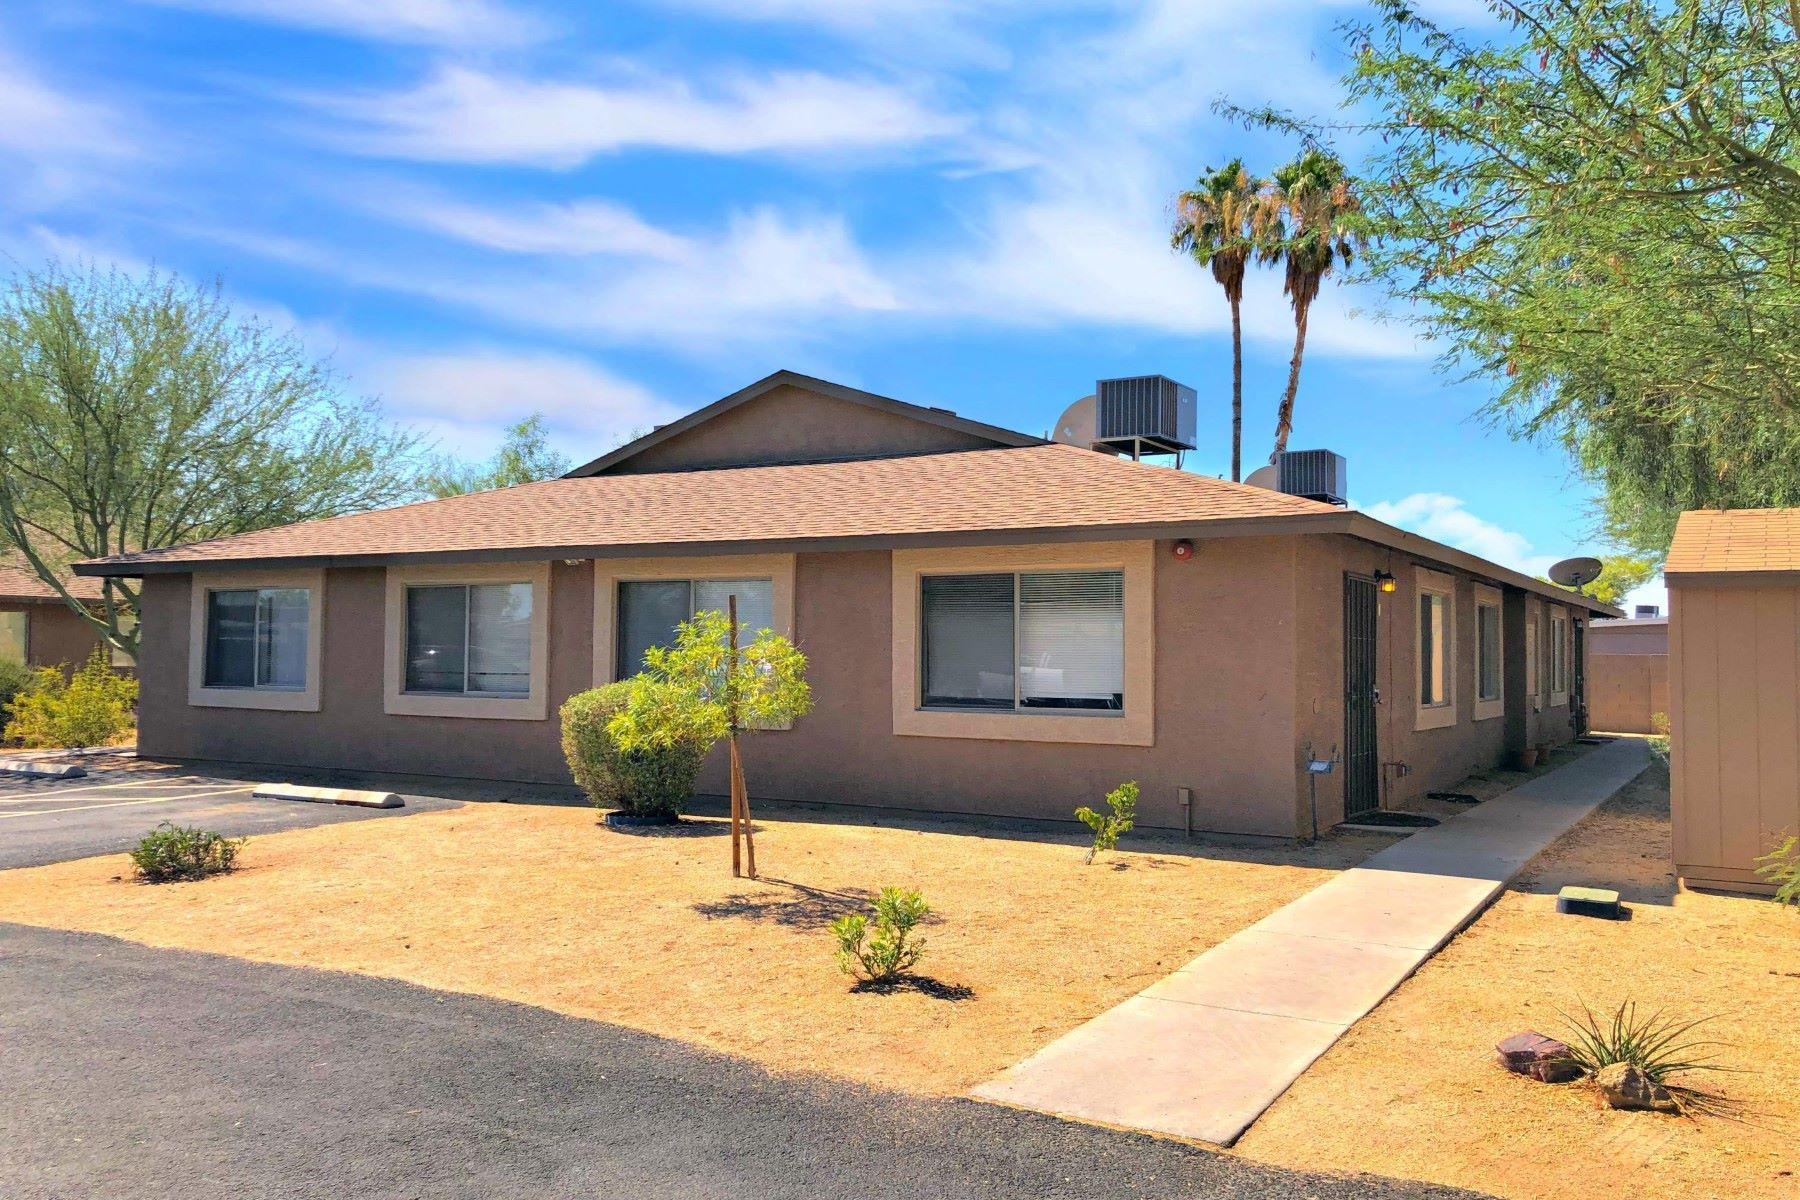 Multi-Family Homes for Sale at 4-plex Gem In Mesa 105 E Ingram ST Mesa, Arizona 85201 United States